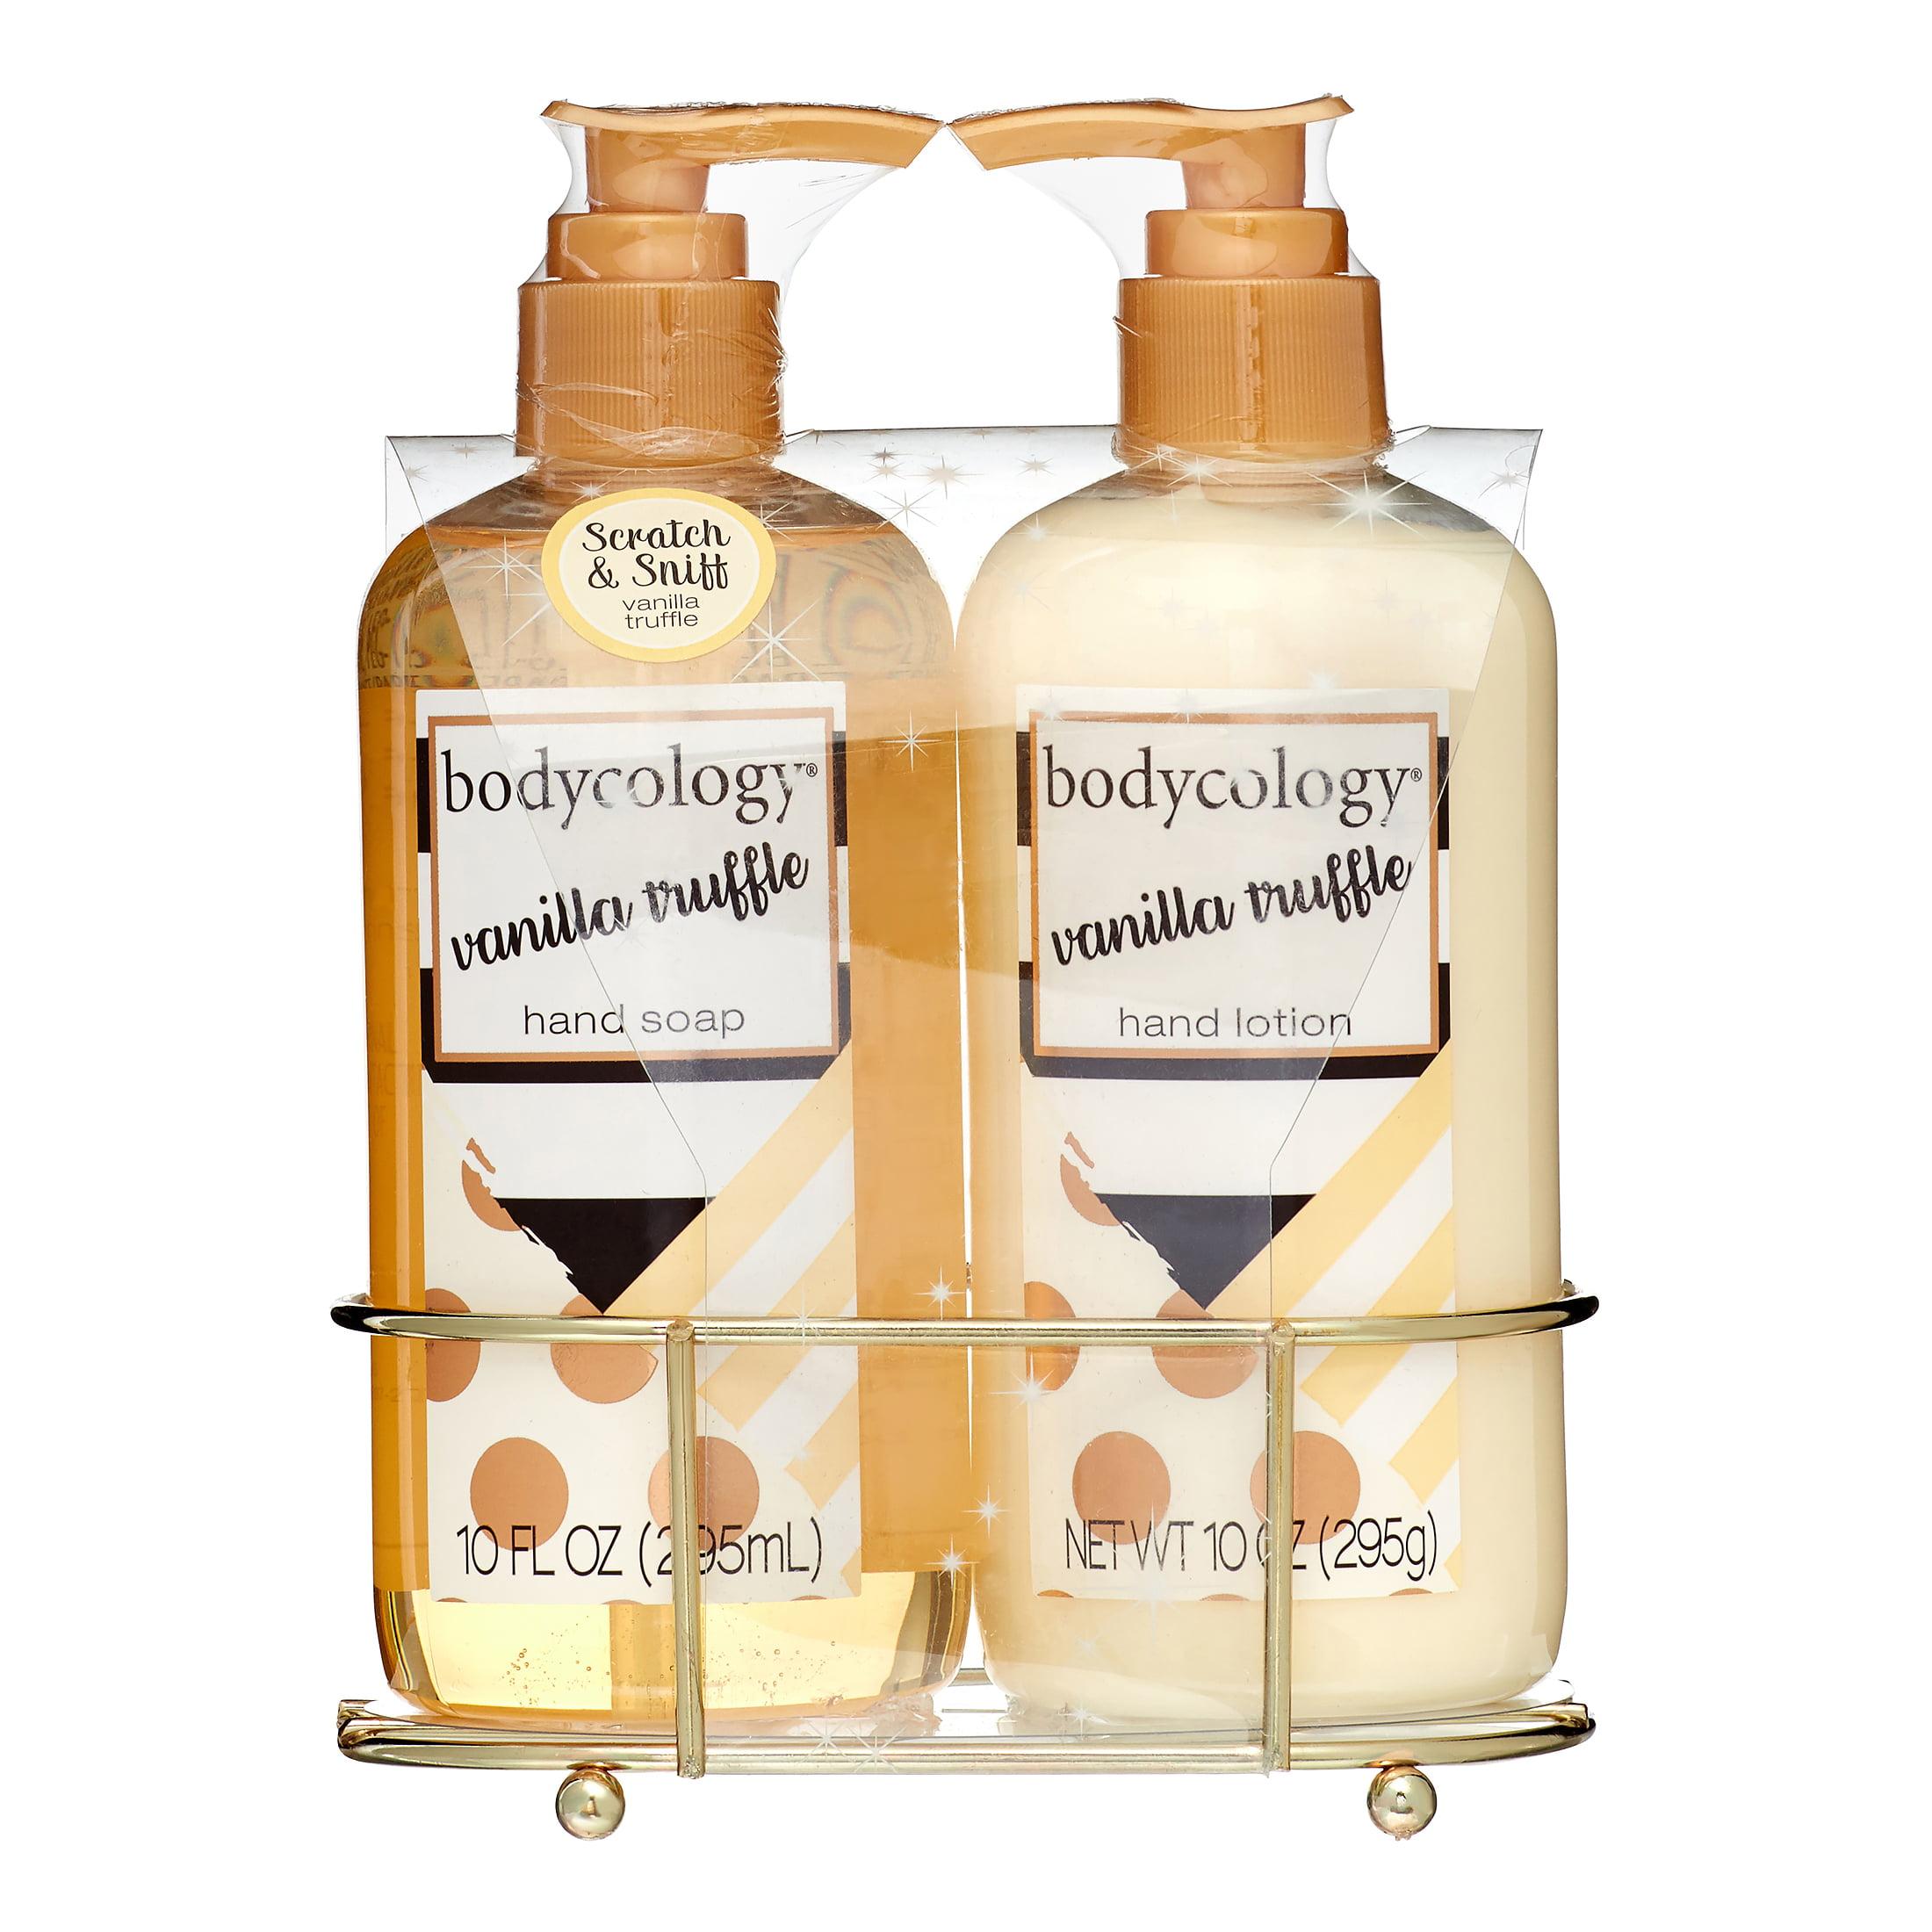 Bodycology Vanilla Truffle Hand Soap & Hand Lotion Gift Set